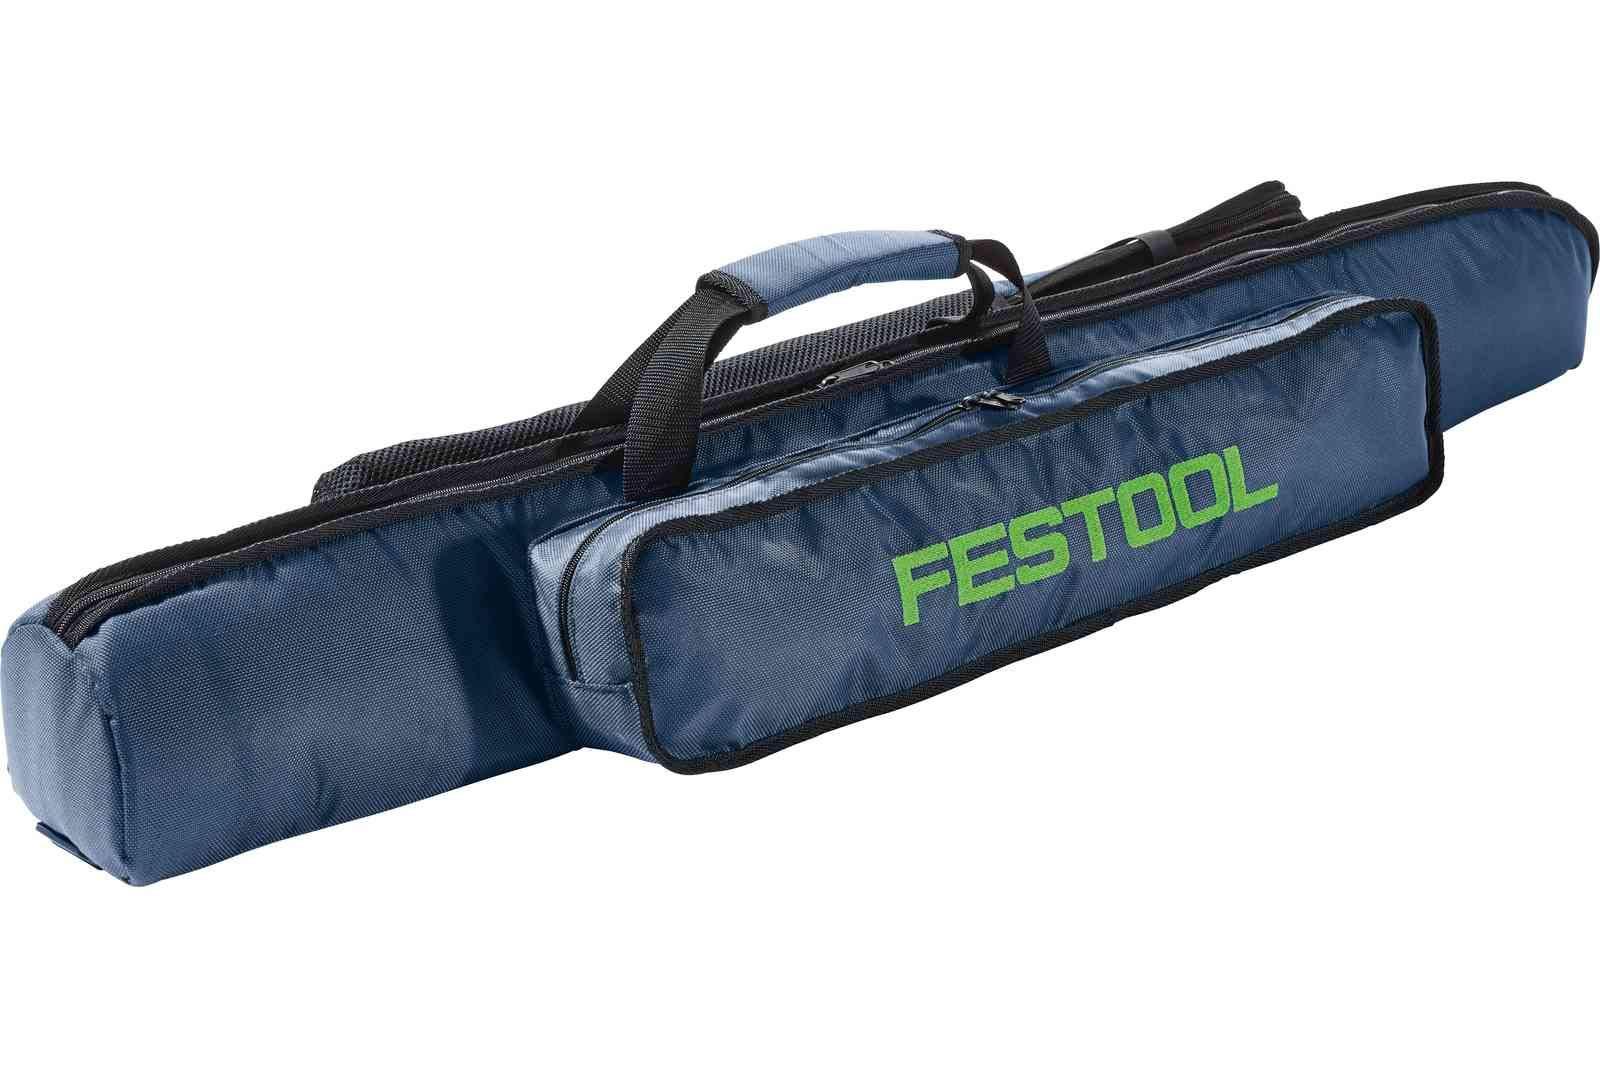 Festool 203639 Syslite Tripod Bag by Festool